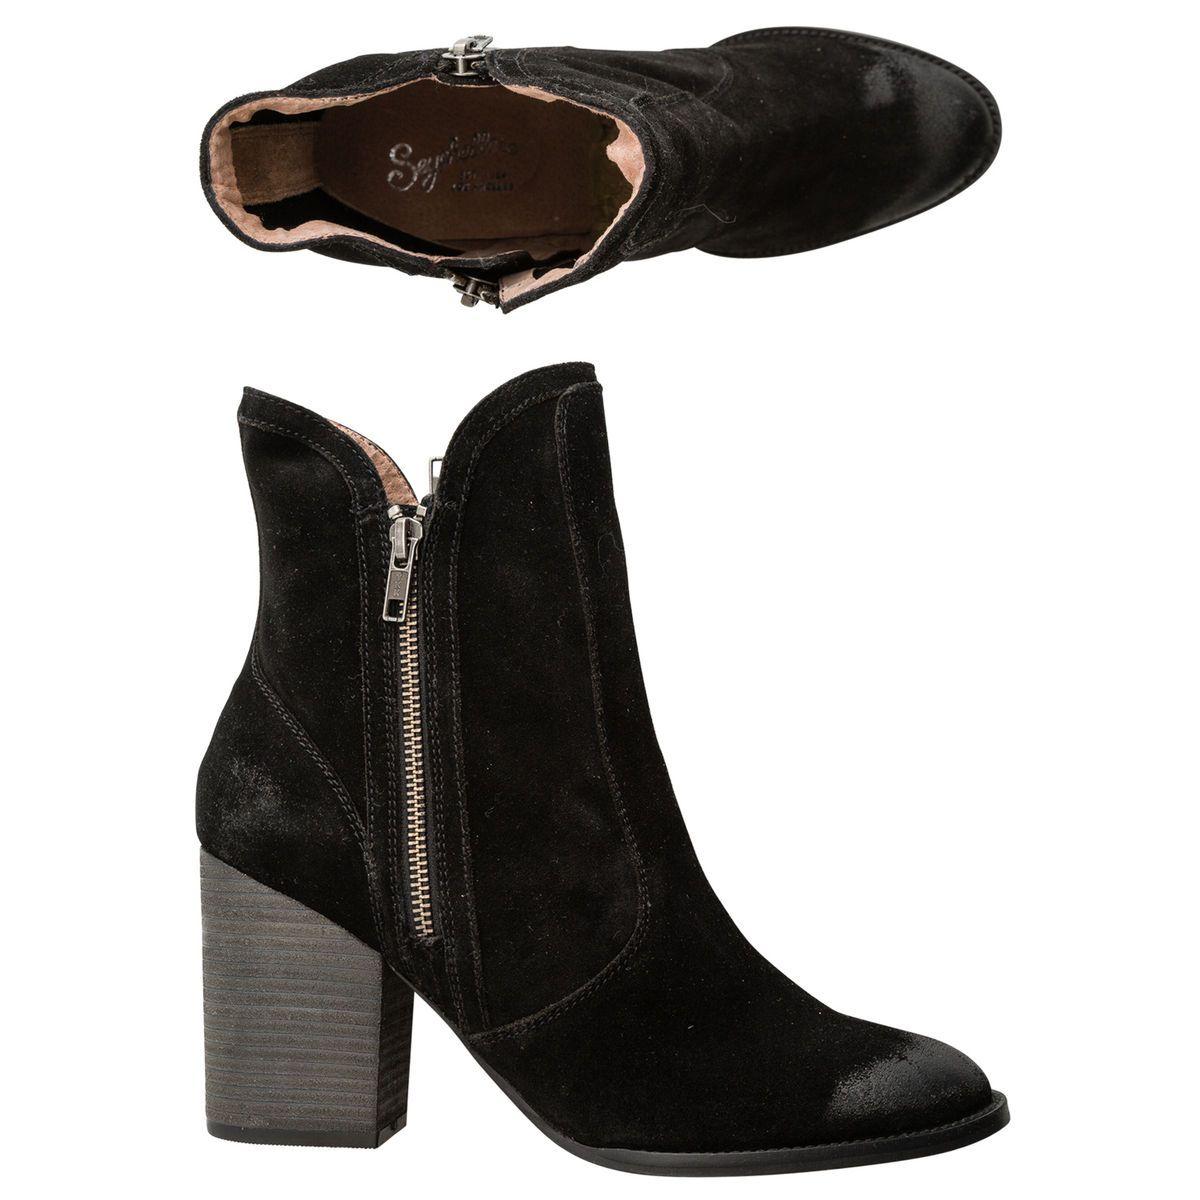 Seychelles Lori Penny boot